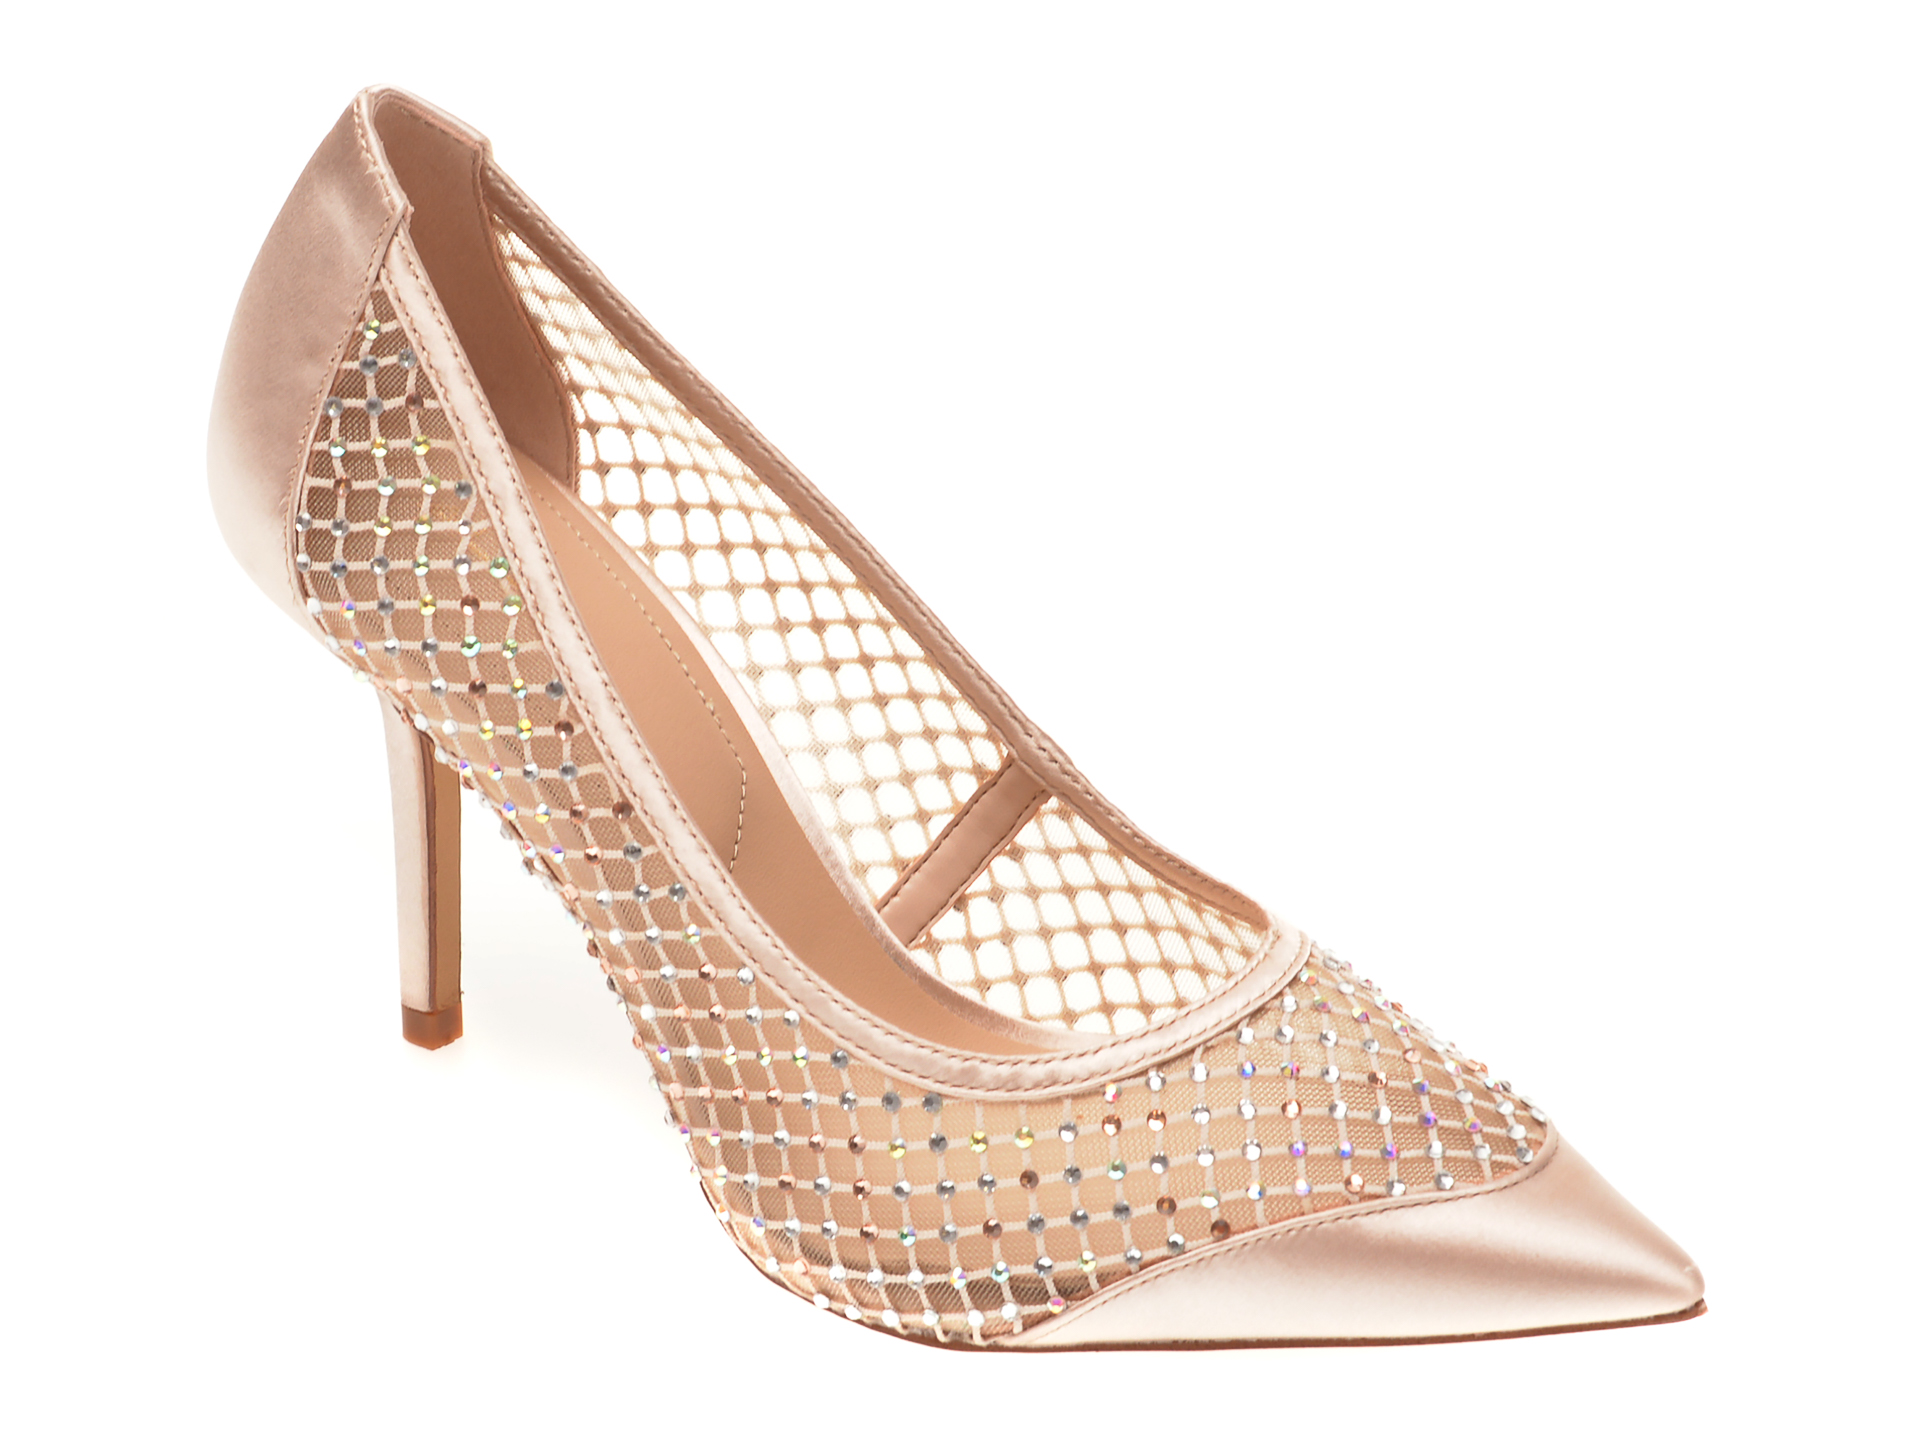 Pantofi ALDO nude, Dimitras680, din material textil